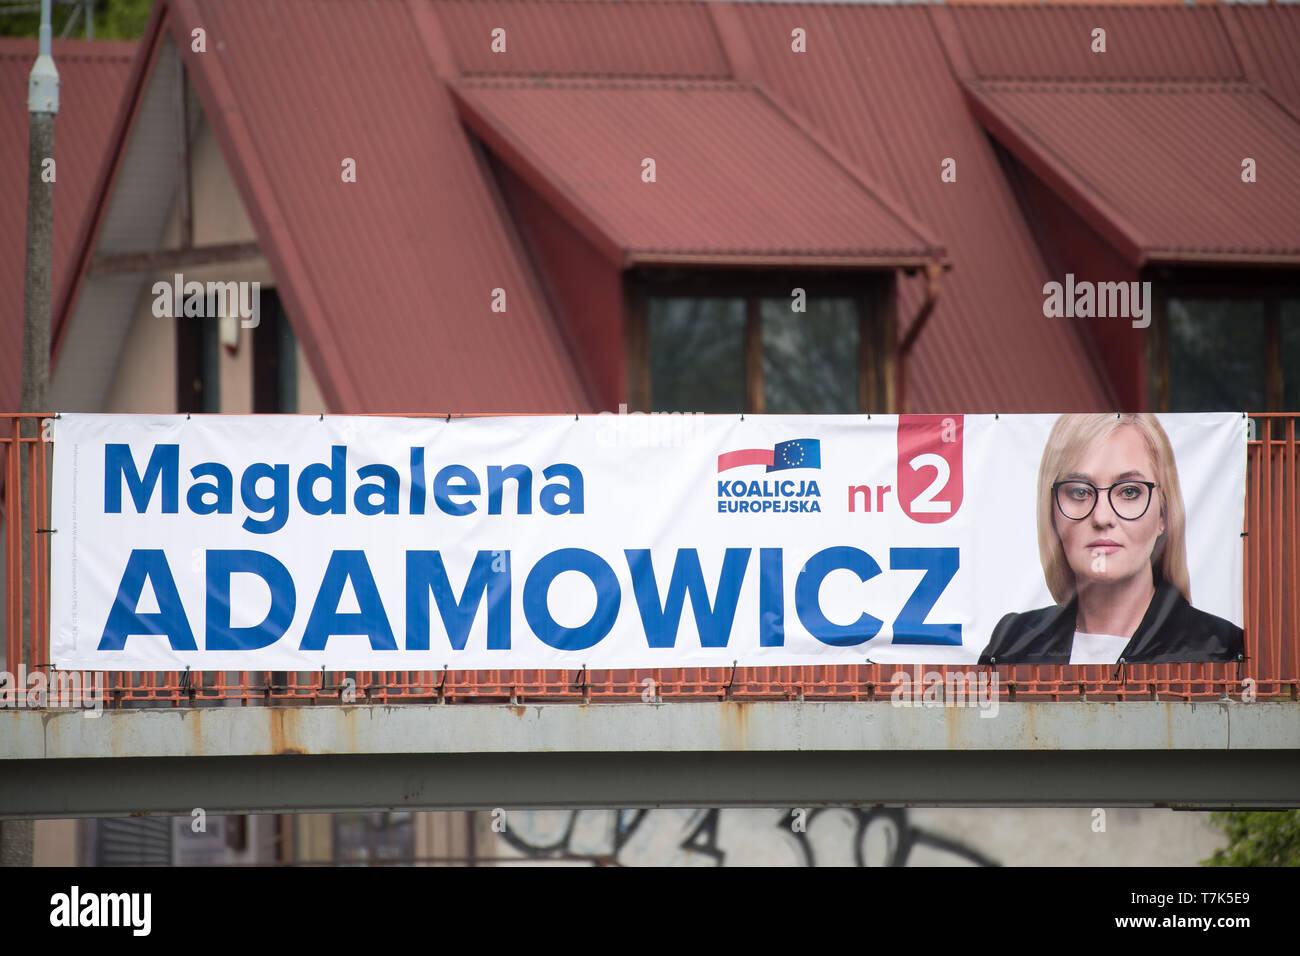 Magdalena Adamowicz's bilboard, candidate of Koalicja Europejska (European Coalition) in 2019 European Parliament election campaign. Gdansk, Poland. M - Stock Image